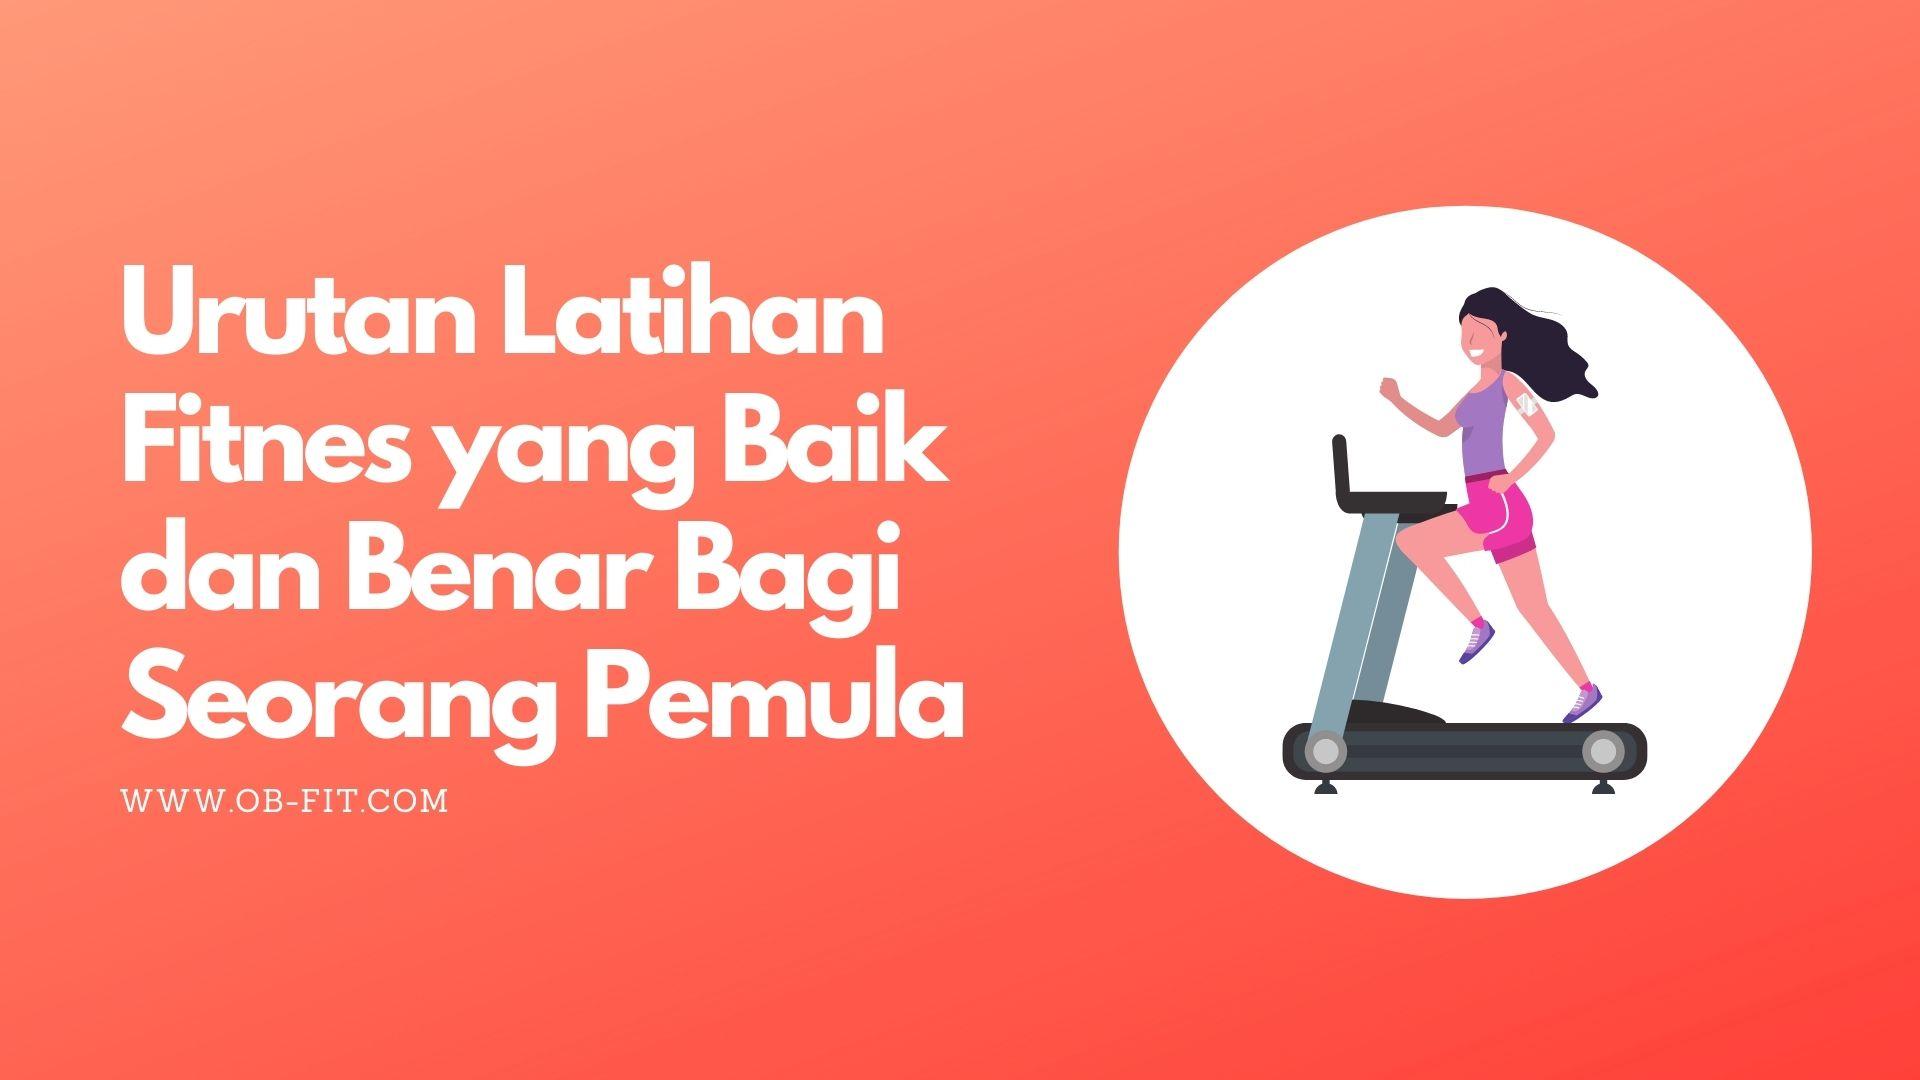 7+ Urutan Latihan Fitnes yang Baik dan Benar Bagi Seorang Pemula